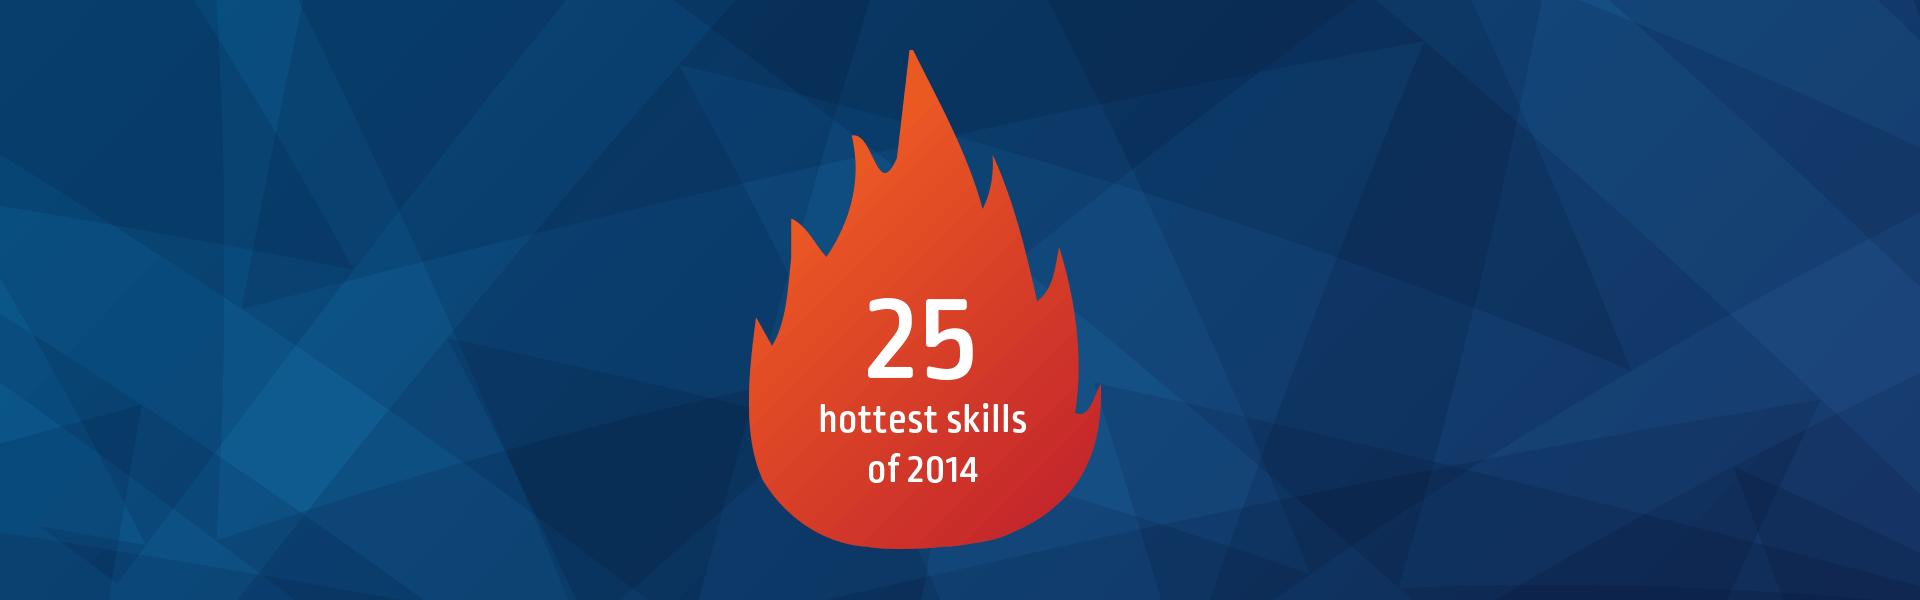 LinkedIn's 25 most in-demand skills of 2014